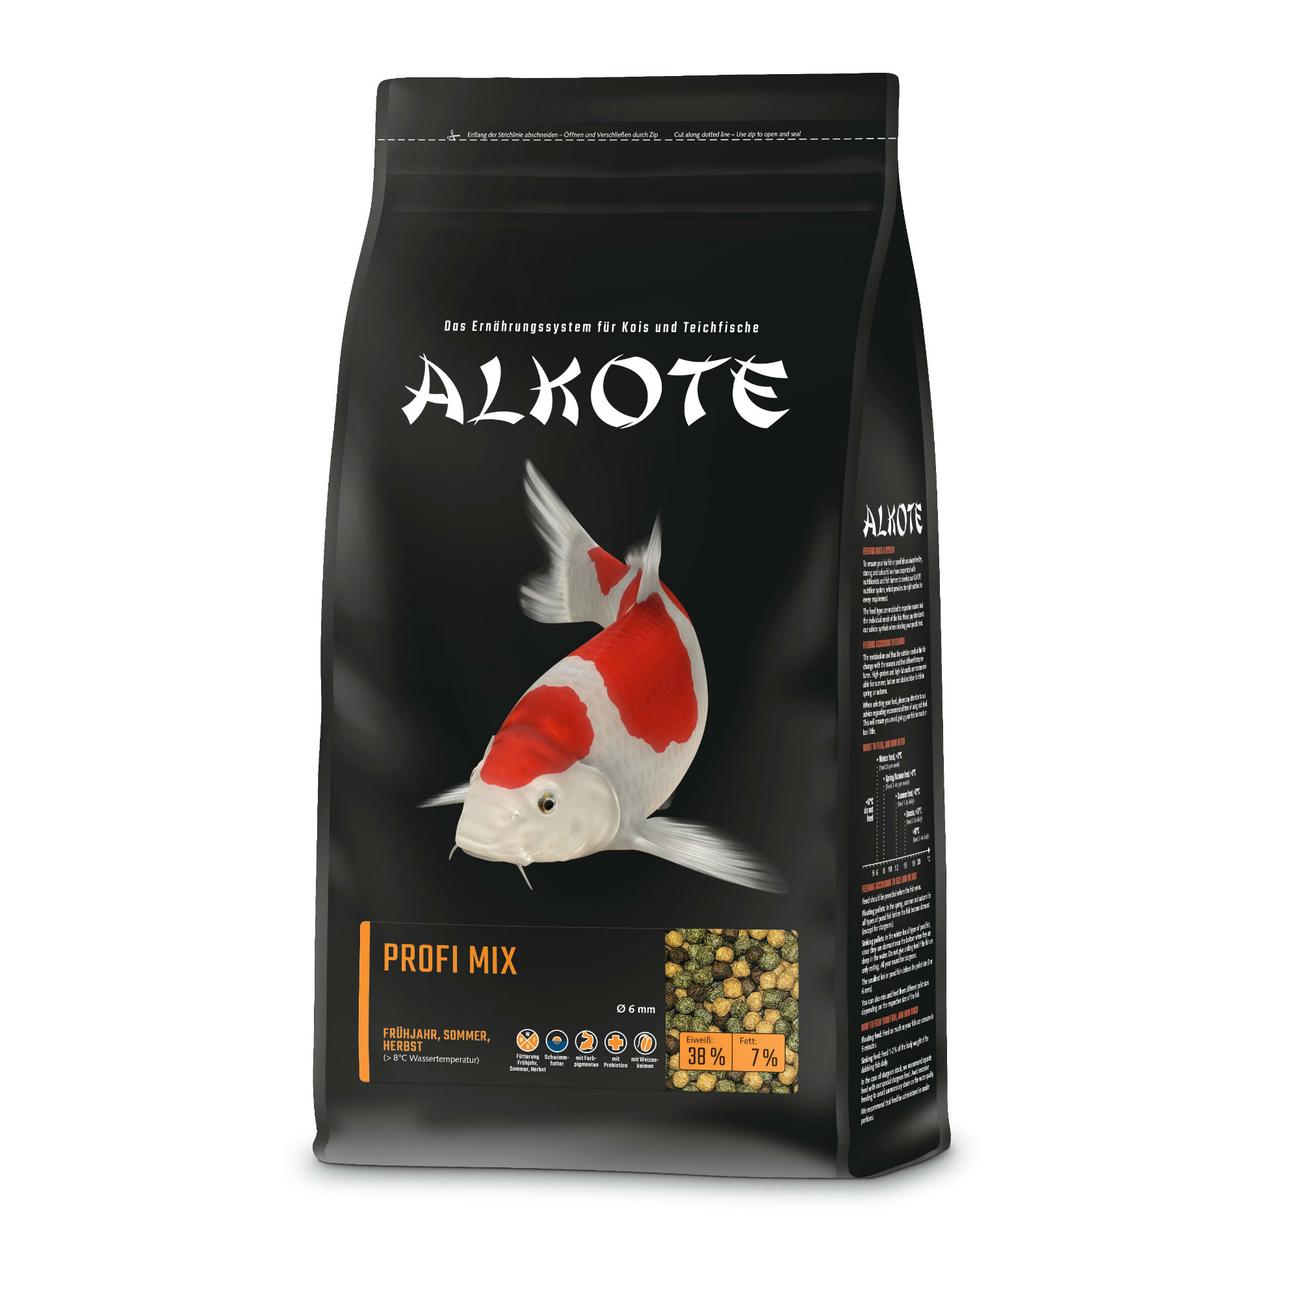 AL-KO-TE Alkote Koifutter Premium Profi Mix, Bild 2